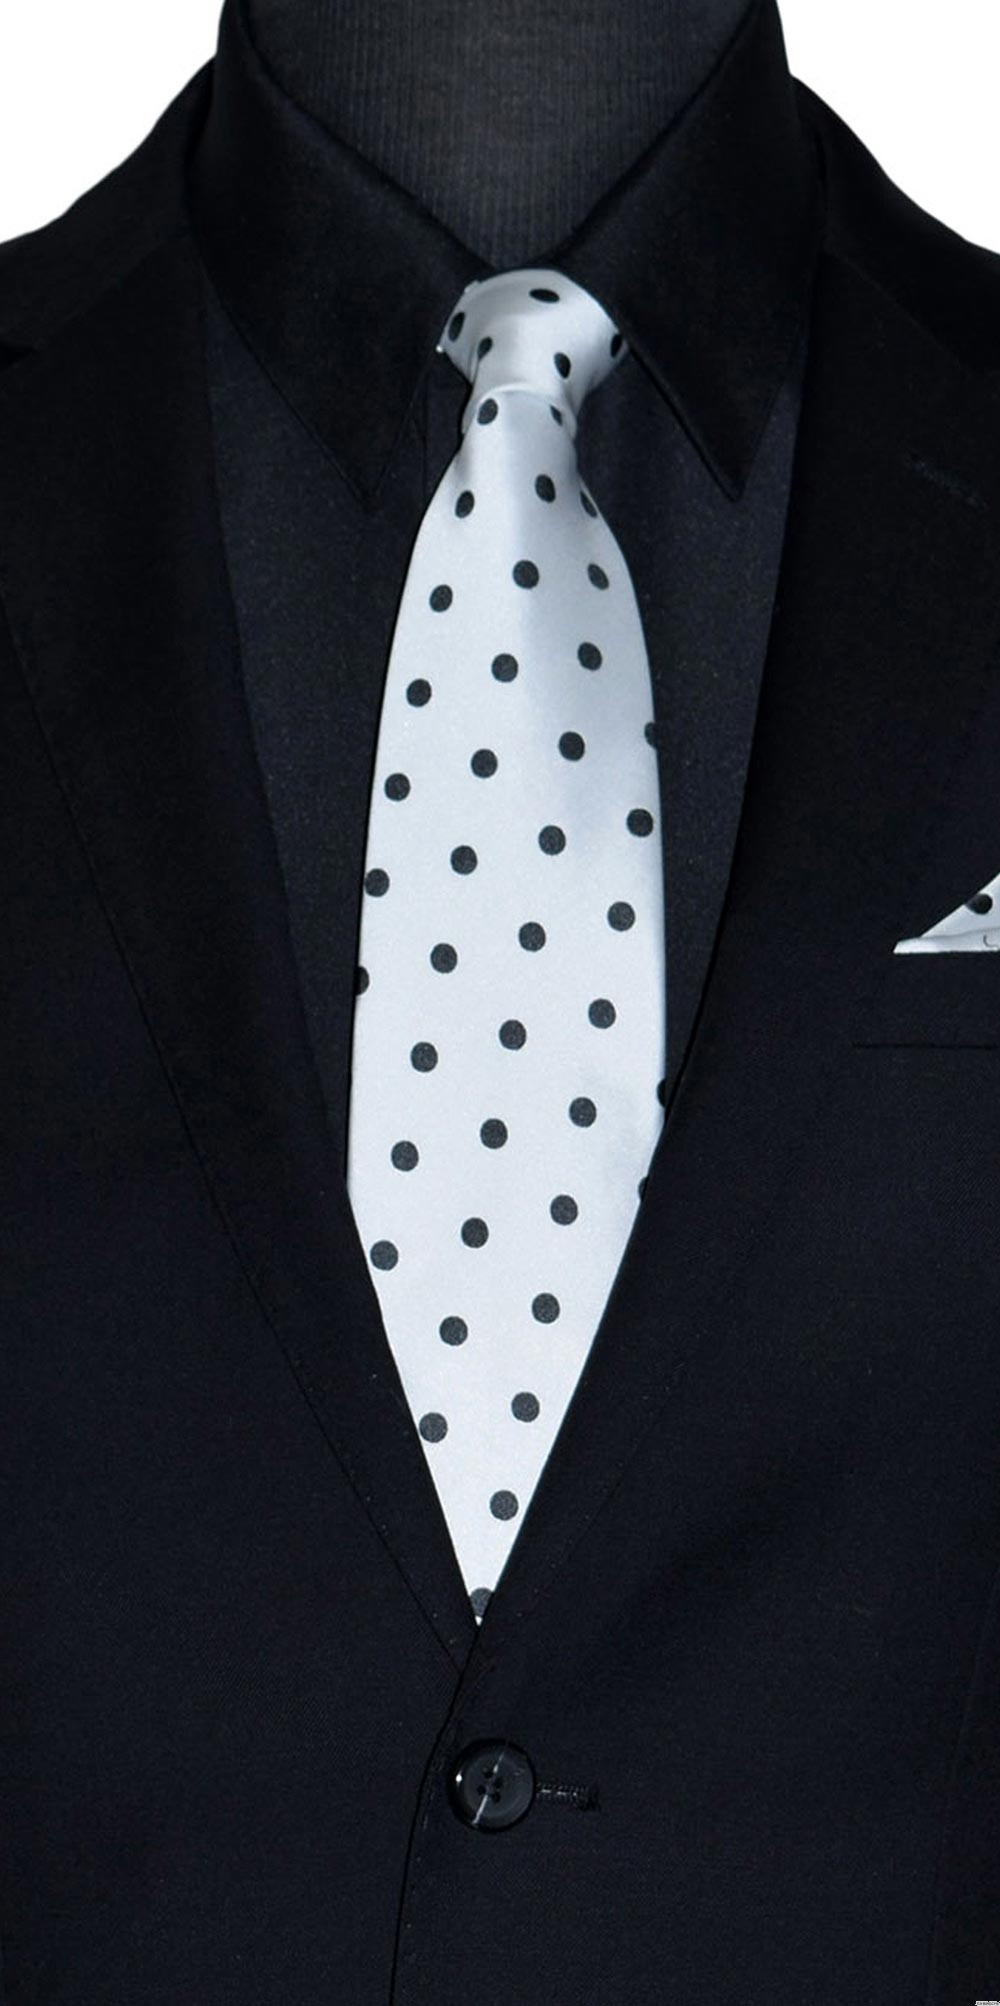 men's white dress tie with black polka dots